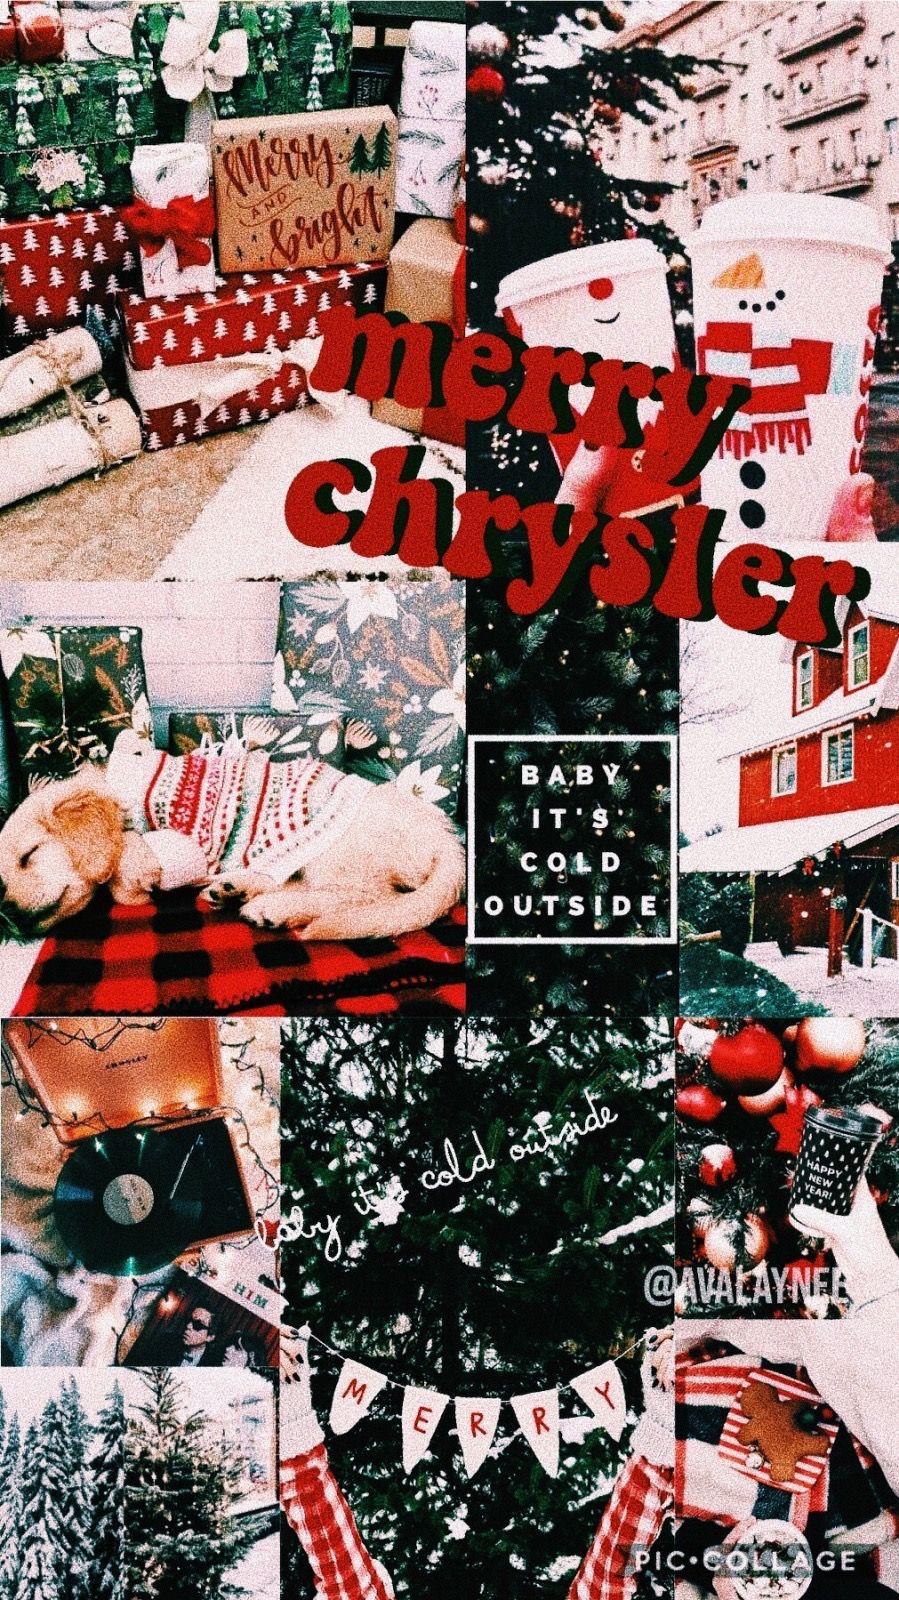 Vsco Avalaynee Cute Christmas Wallpaper Christmas Collage Wallpaper Iphone Christmas